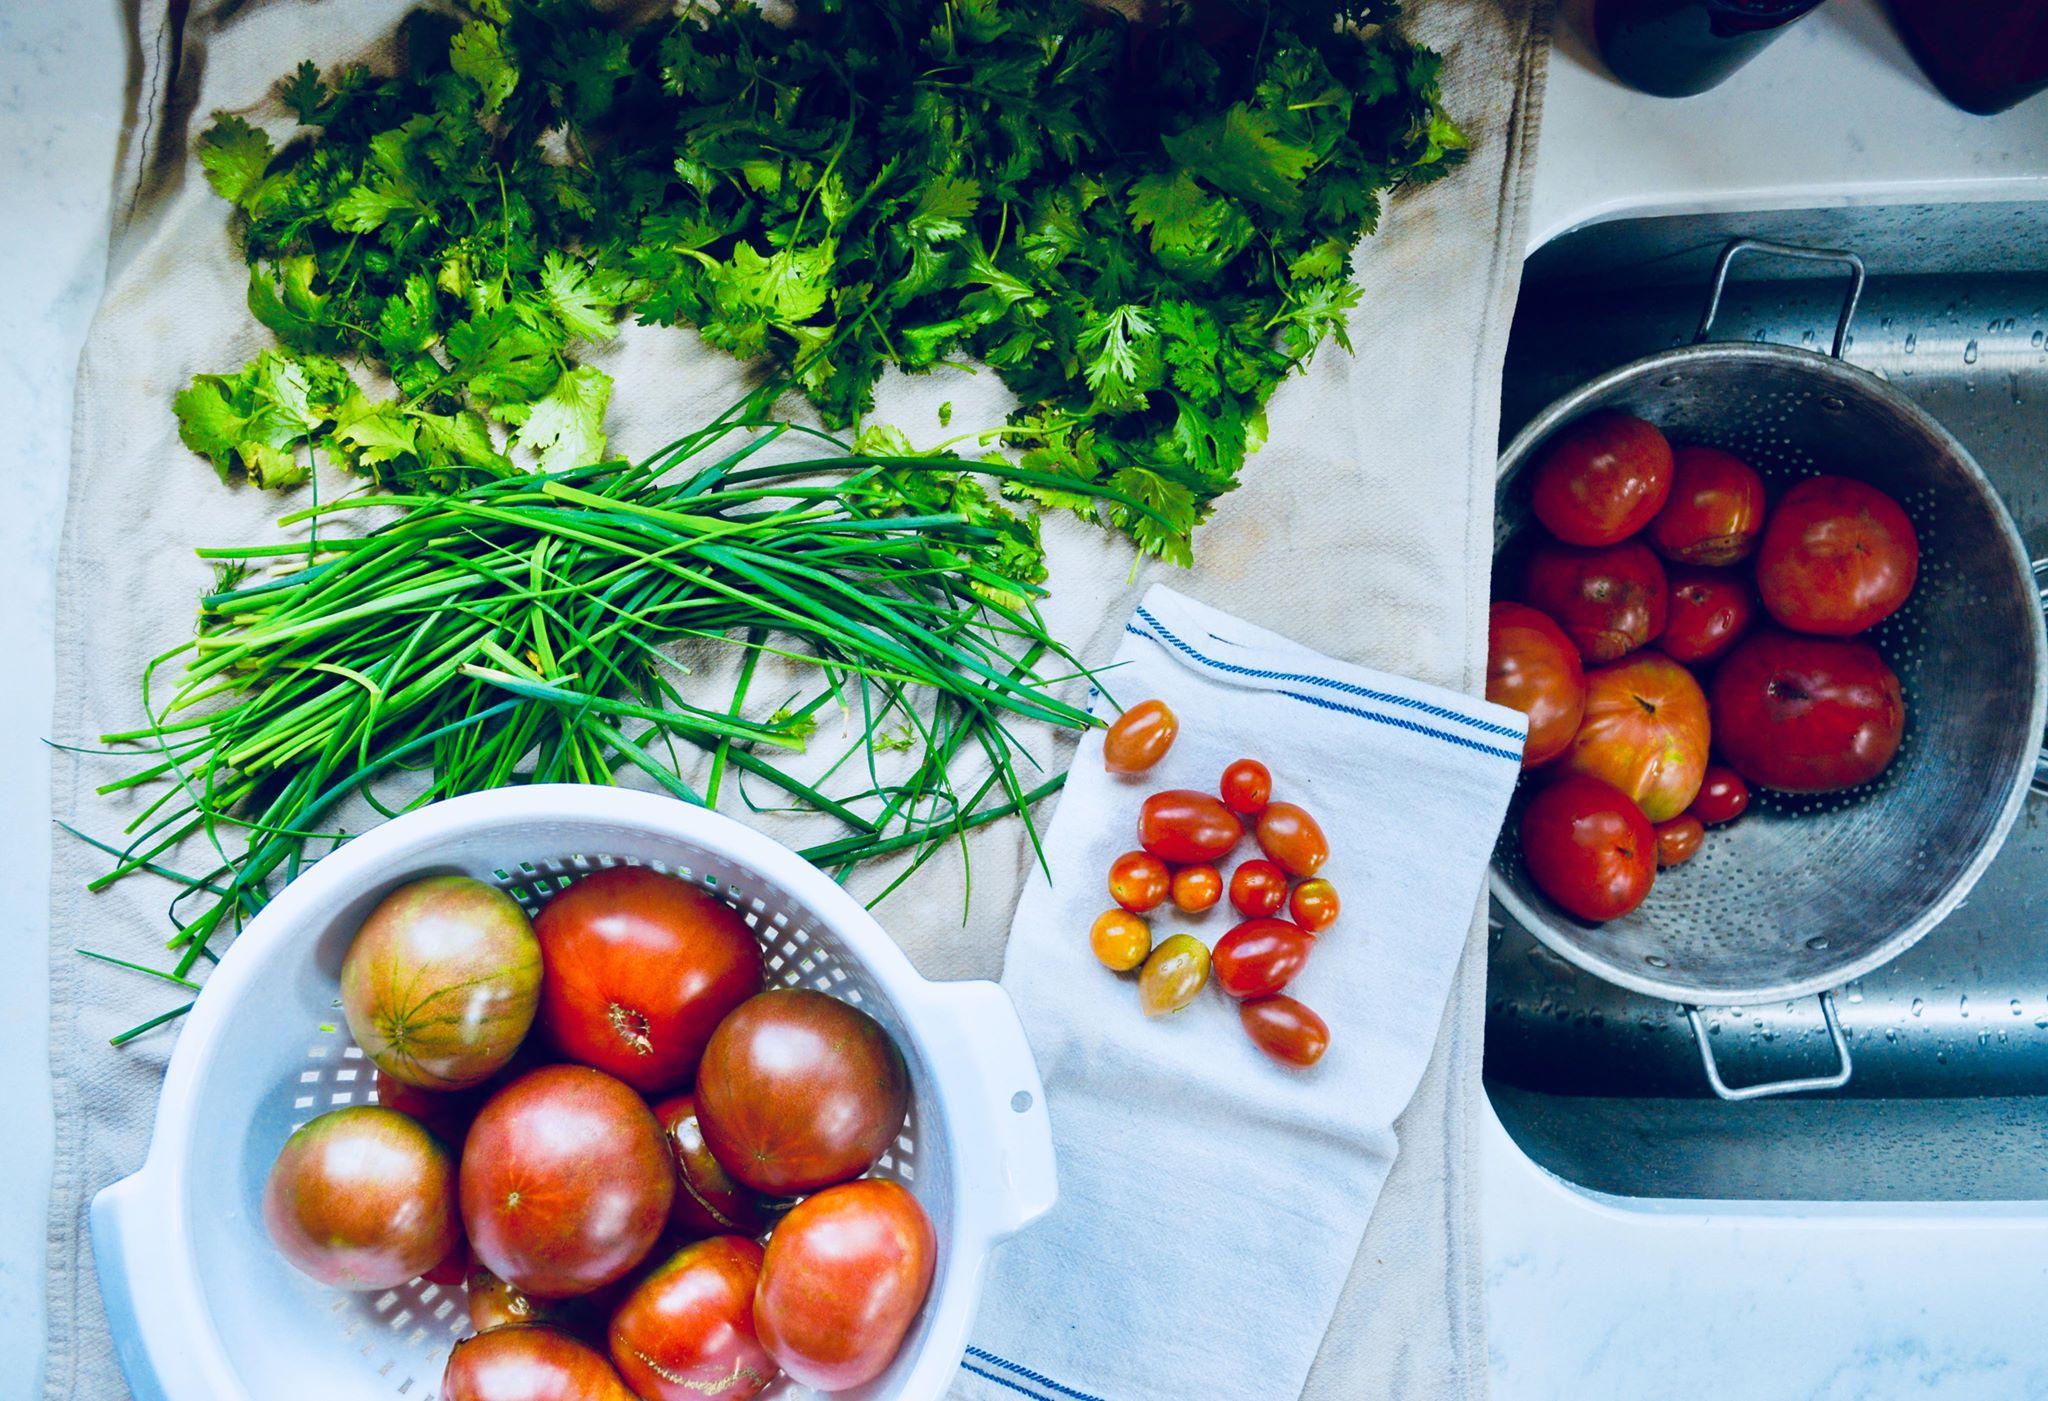 homemade salsa, garden salsa, fresh food, plant based diet, vegan life, modern homestead, homegrown, organic life, clean eating